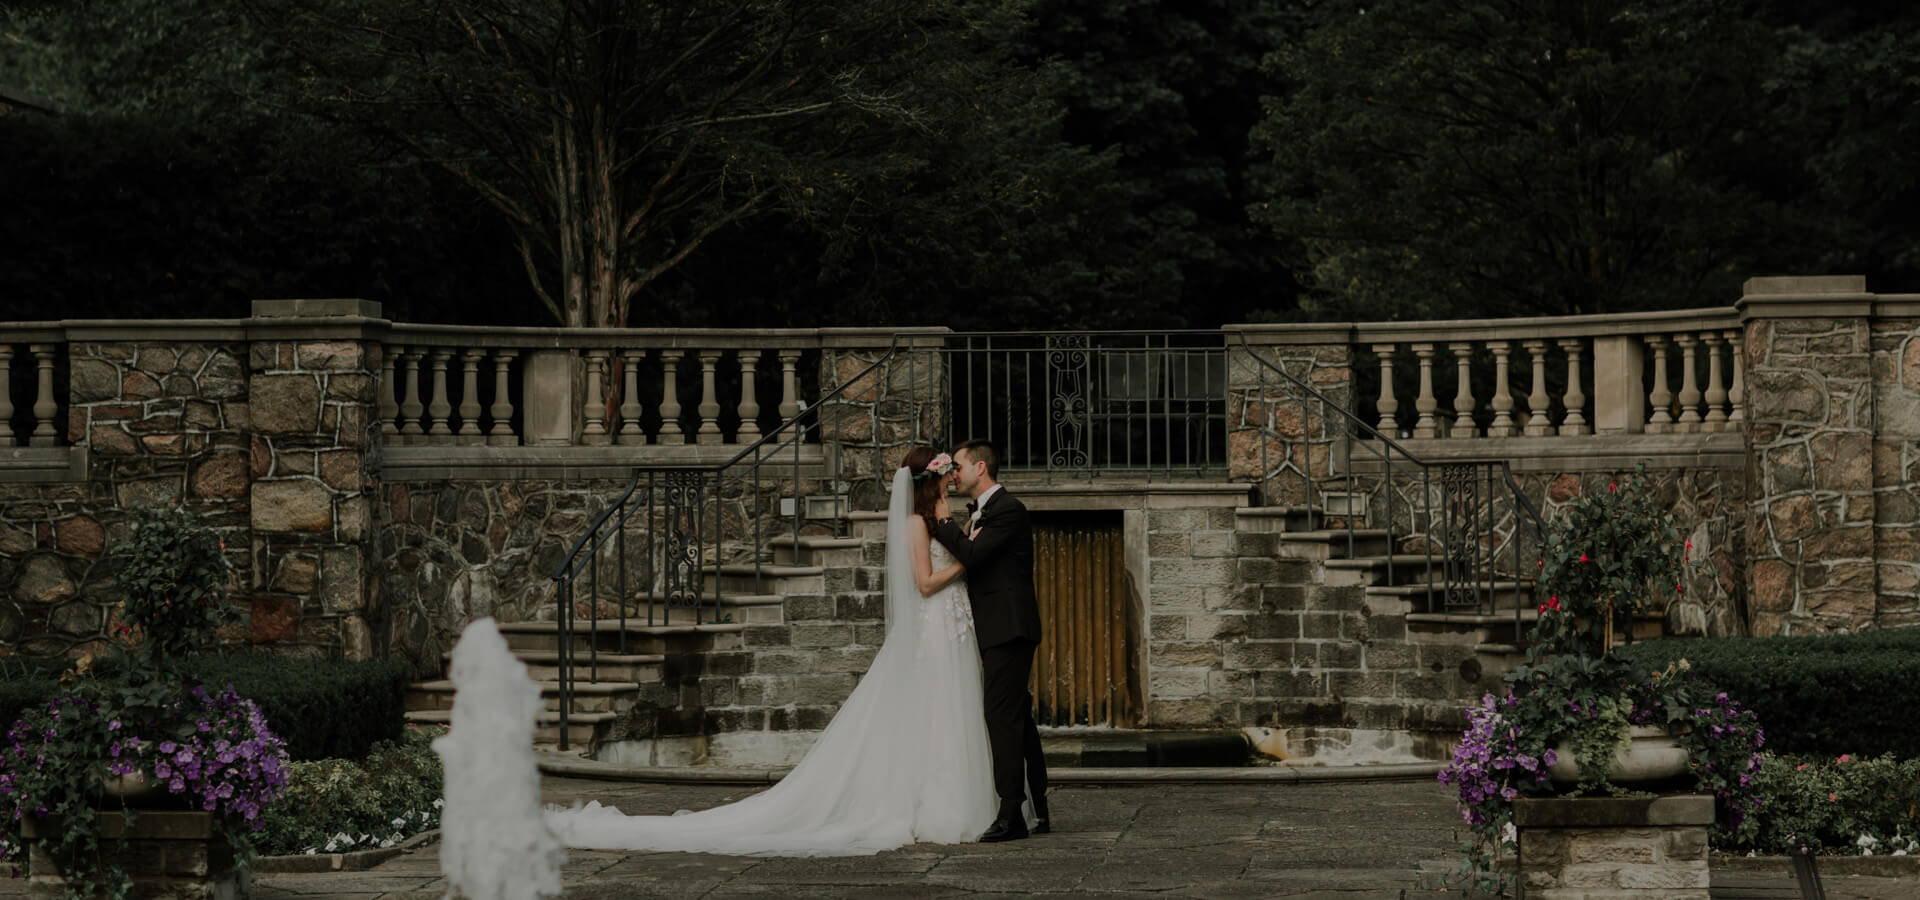 Hero image for Katie and Ken's Romantic Wedding at Graydon Hall Manor